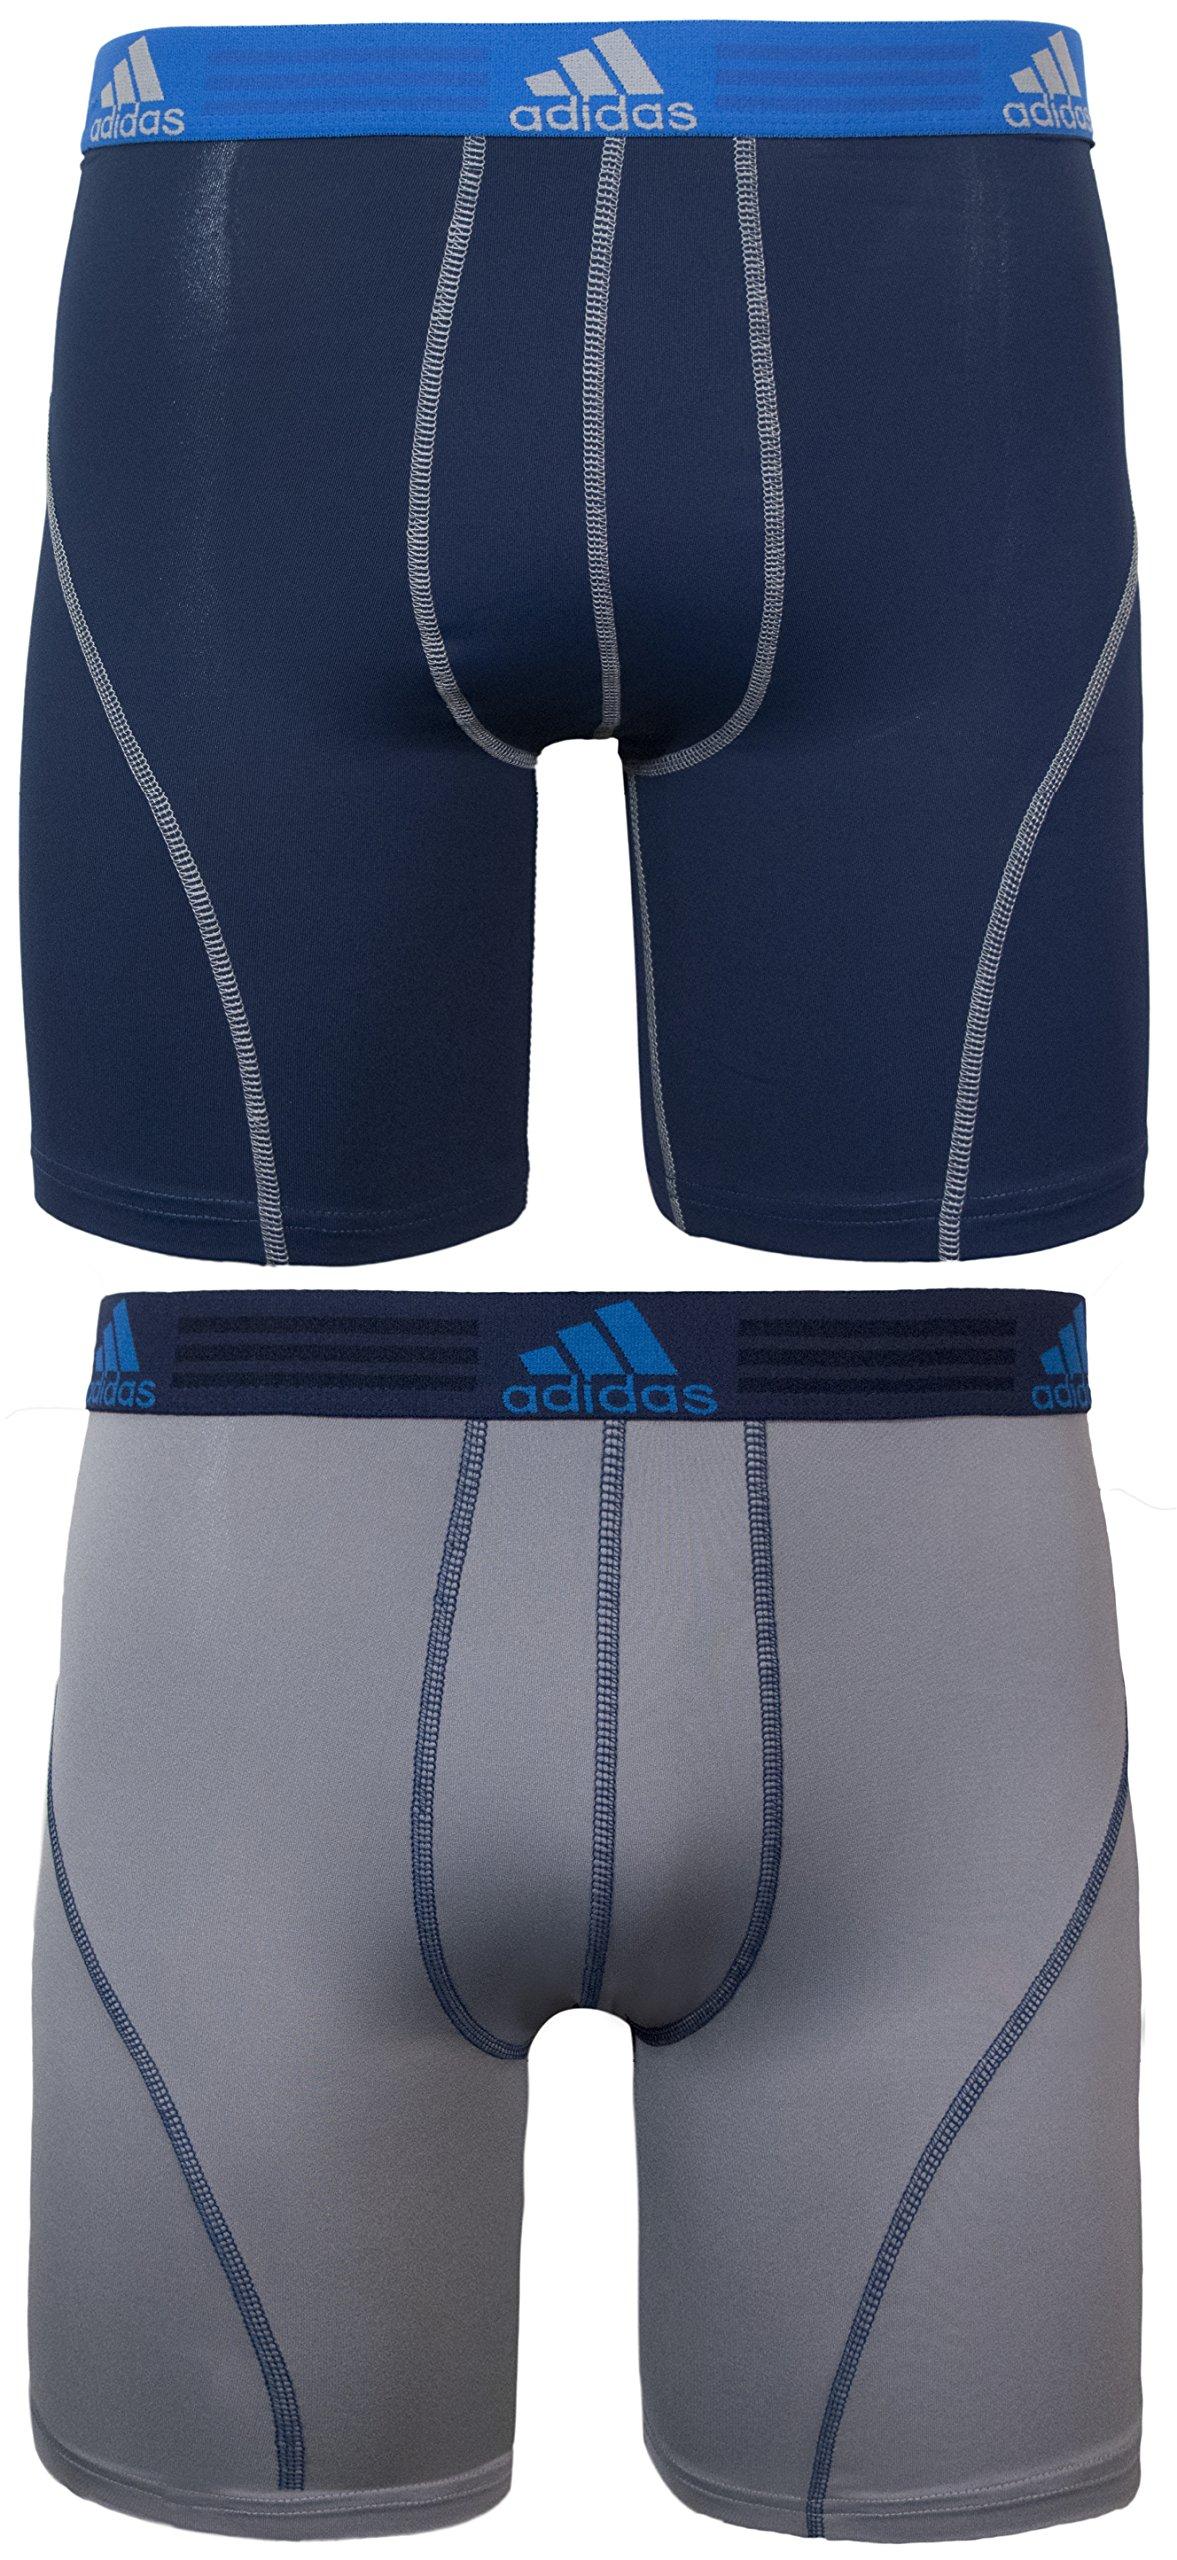 adidas Men's Sport Performance Midway Underwear (2-Pack), Night Indigo/Light Onix Light Onix/Night Indigo, LARGE by adidas